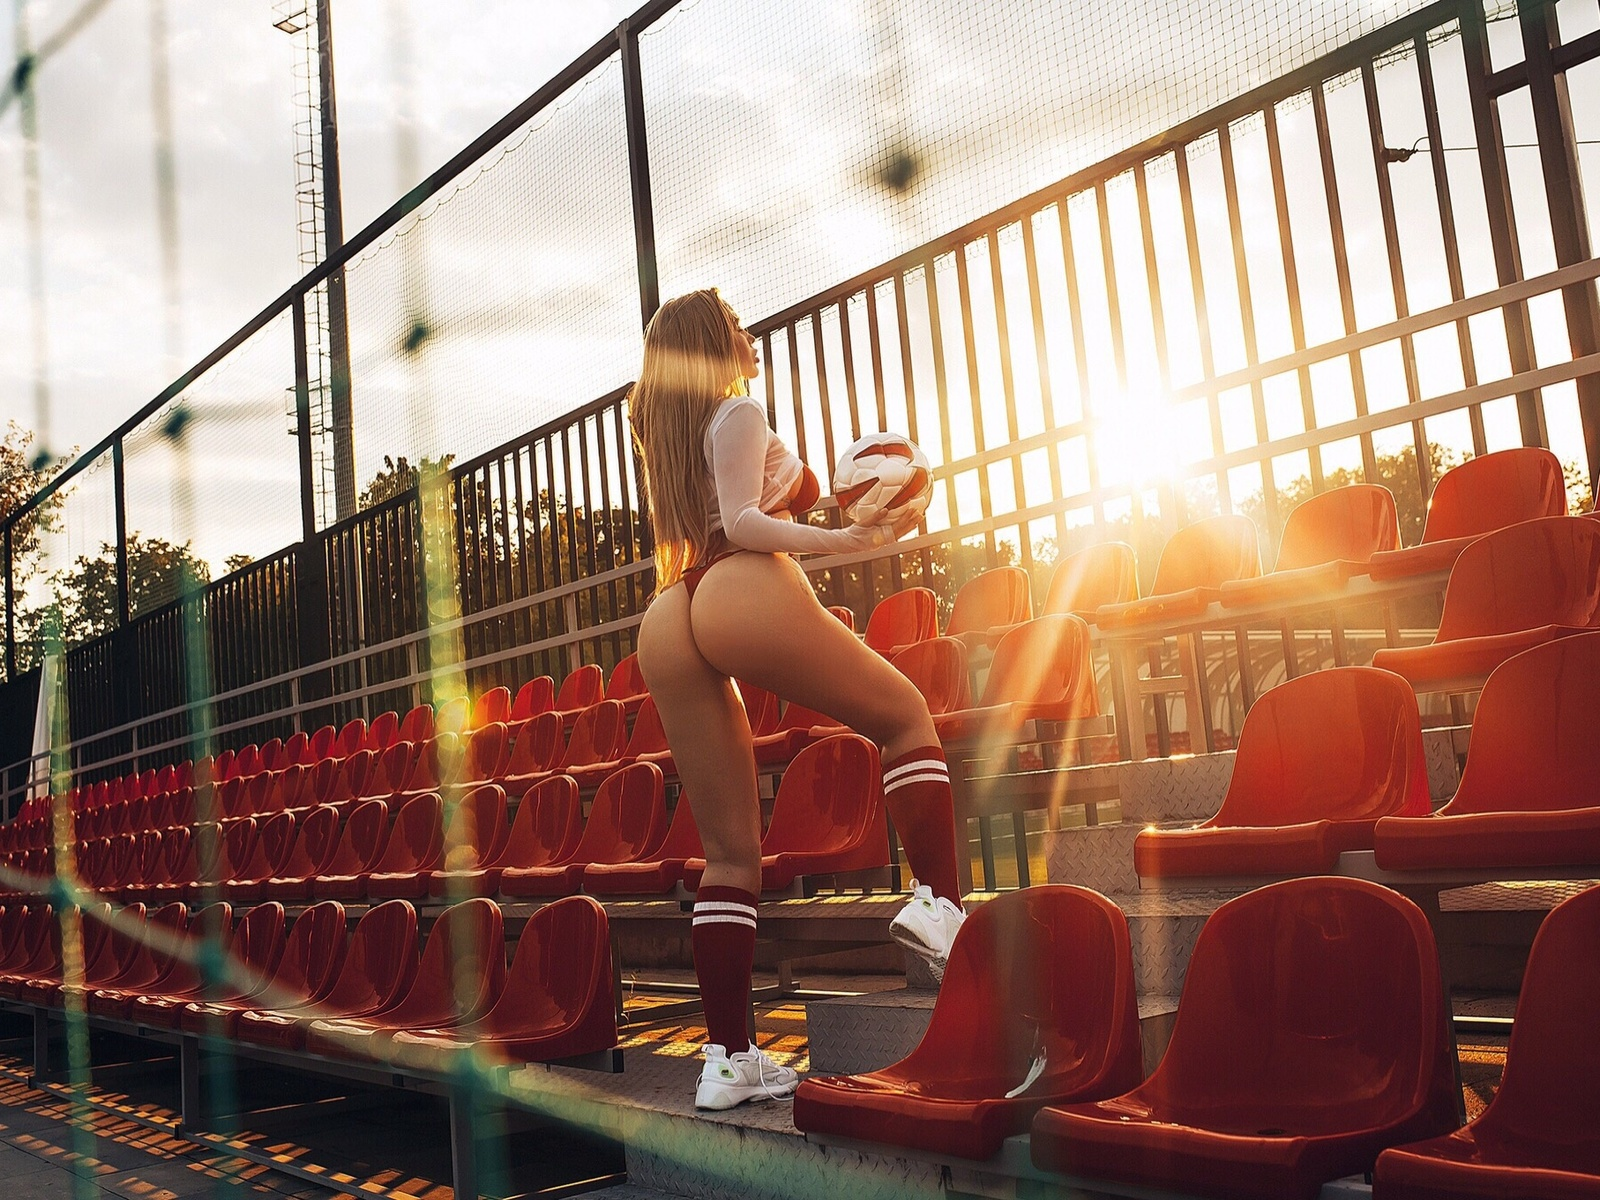 women, ass, blonde, sportswear, red stockings, sneakers, sunset, women outdoors, ball, red bikini, long hair, tattoo